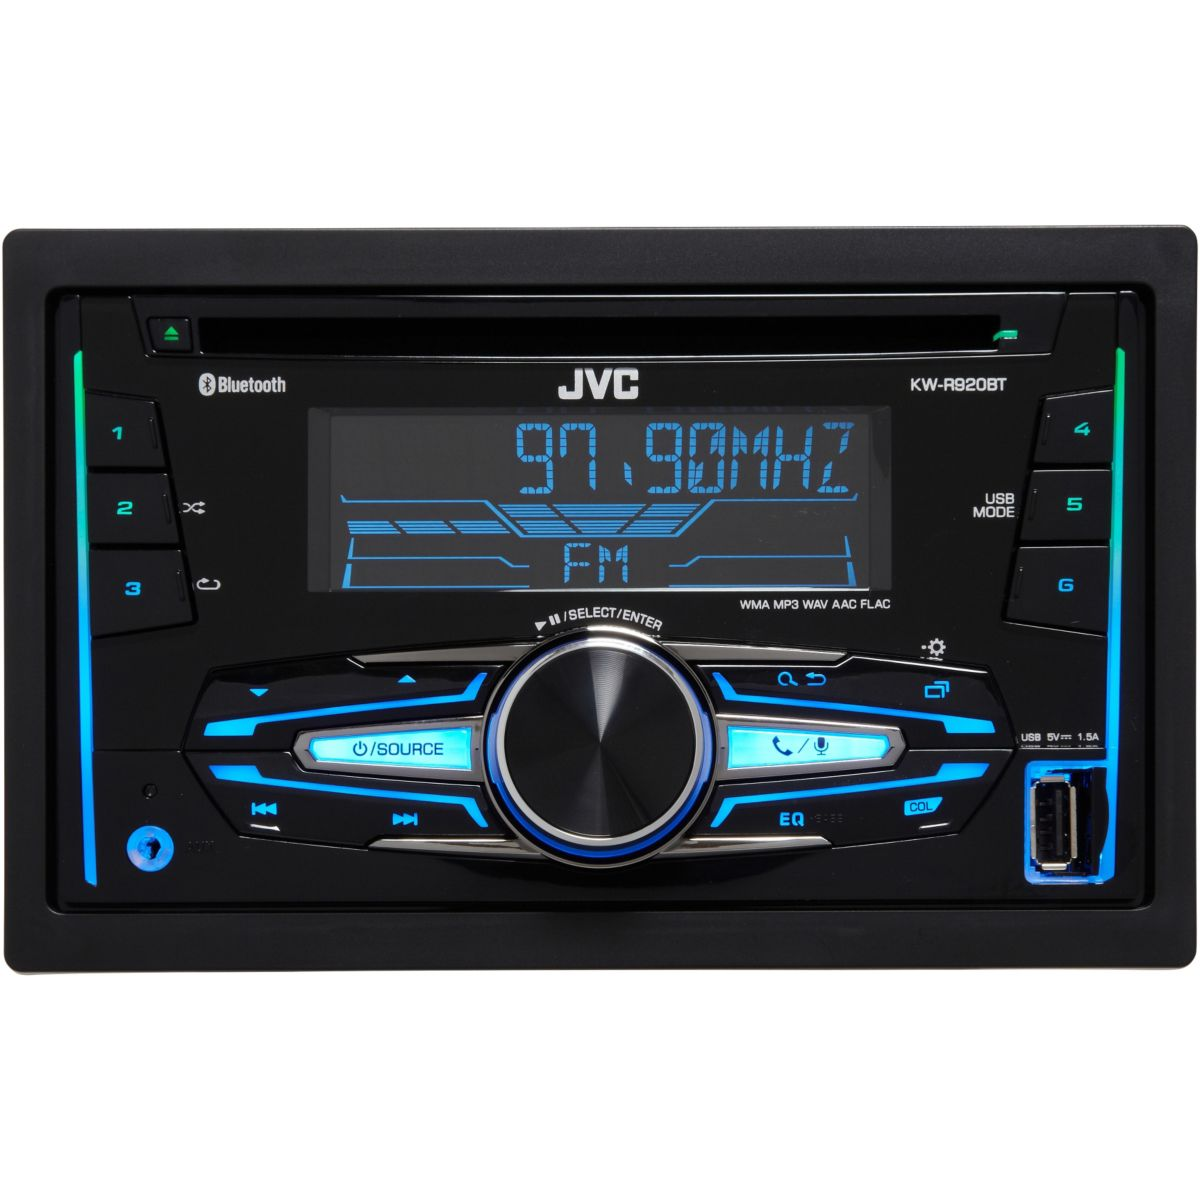 Autoradio CD JVC KW-R920BT